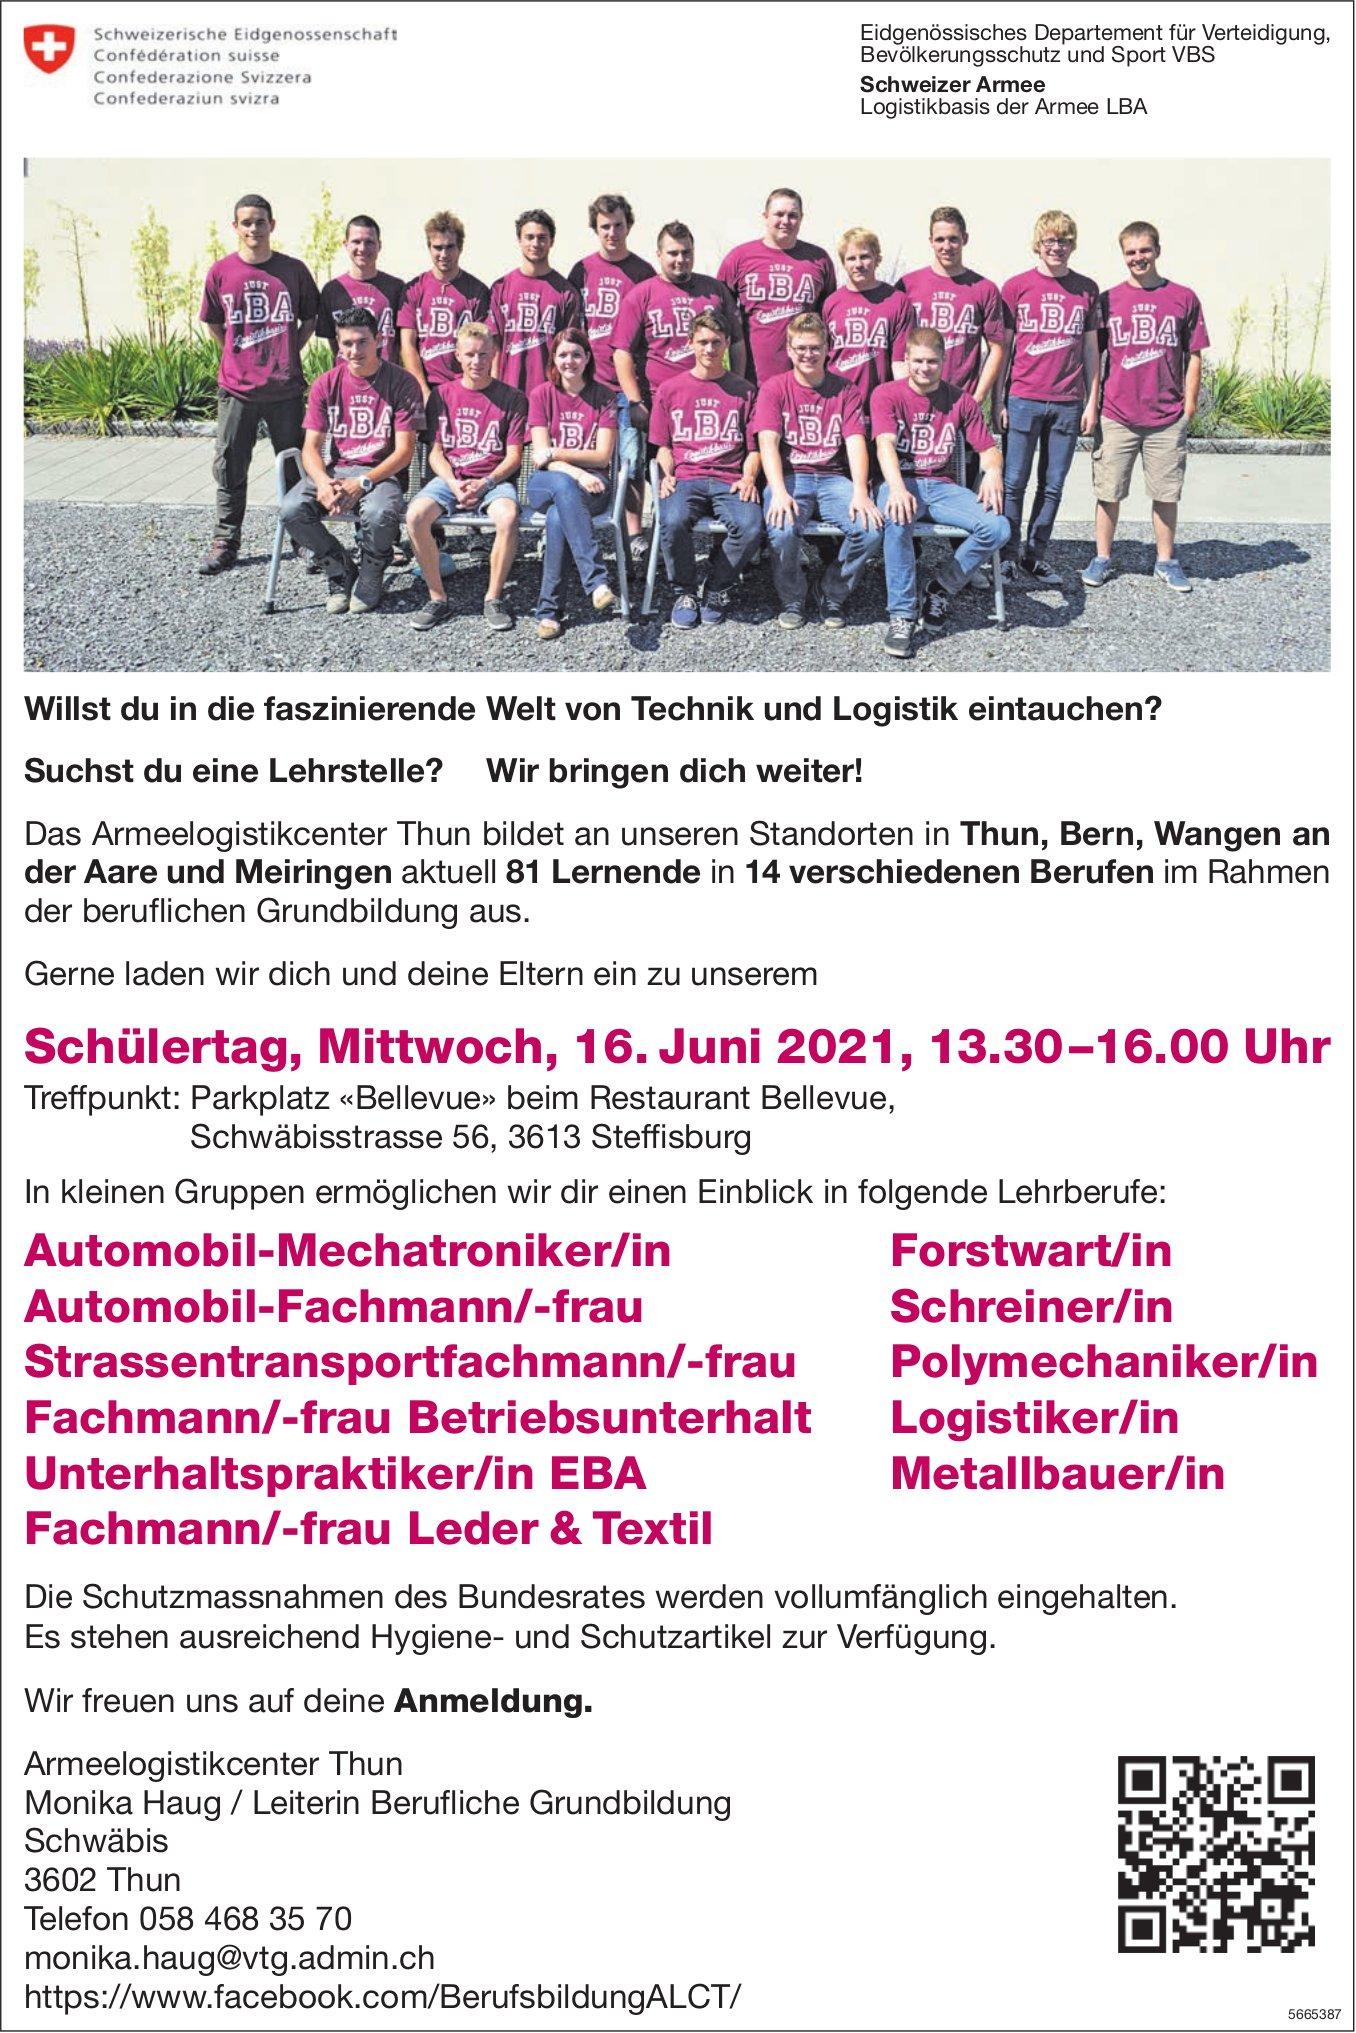 Schülertag, 16. Juni 2021, Armeelogistikcenter Thun, Steffisburg